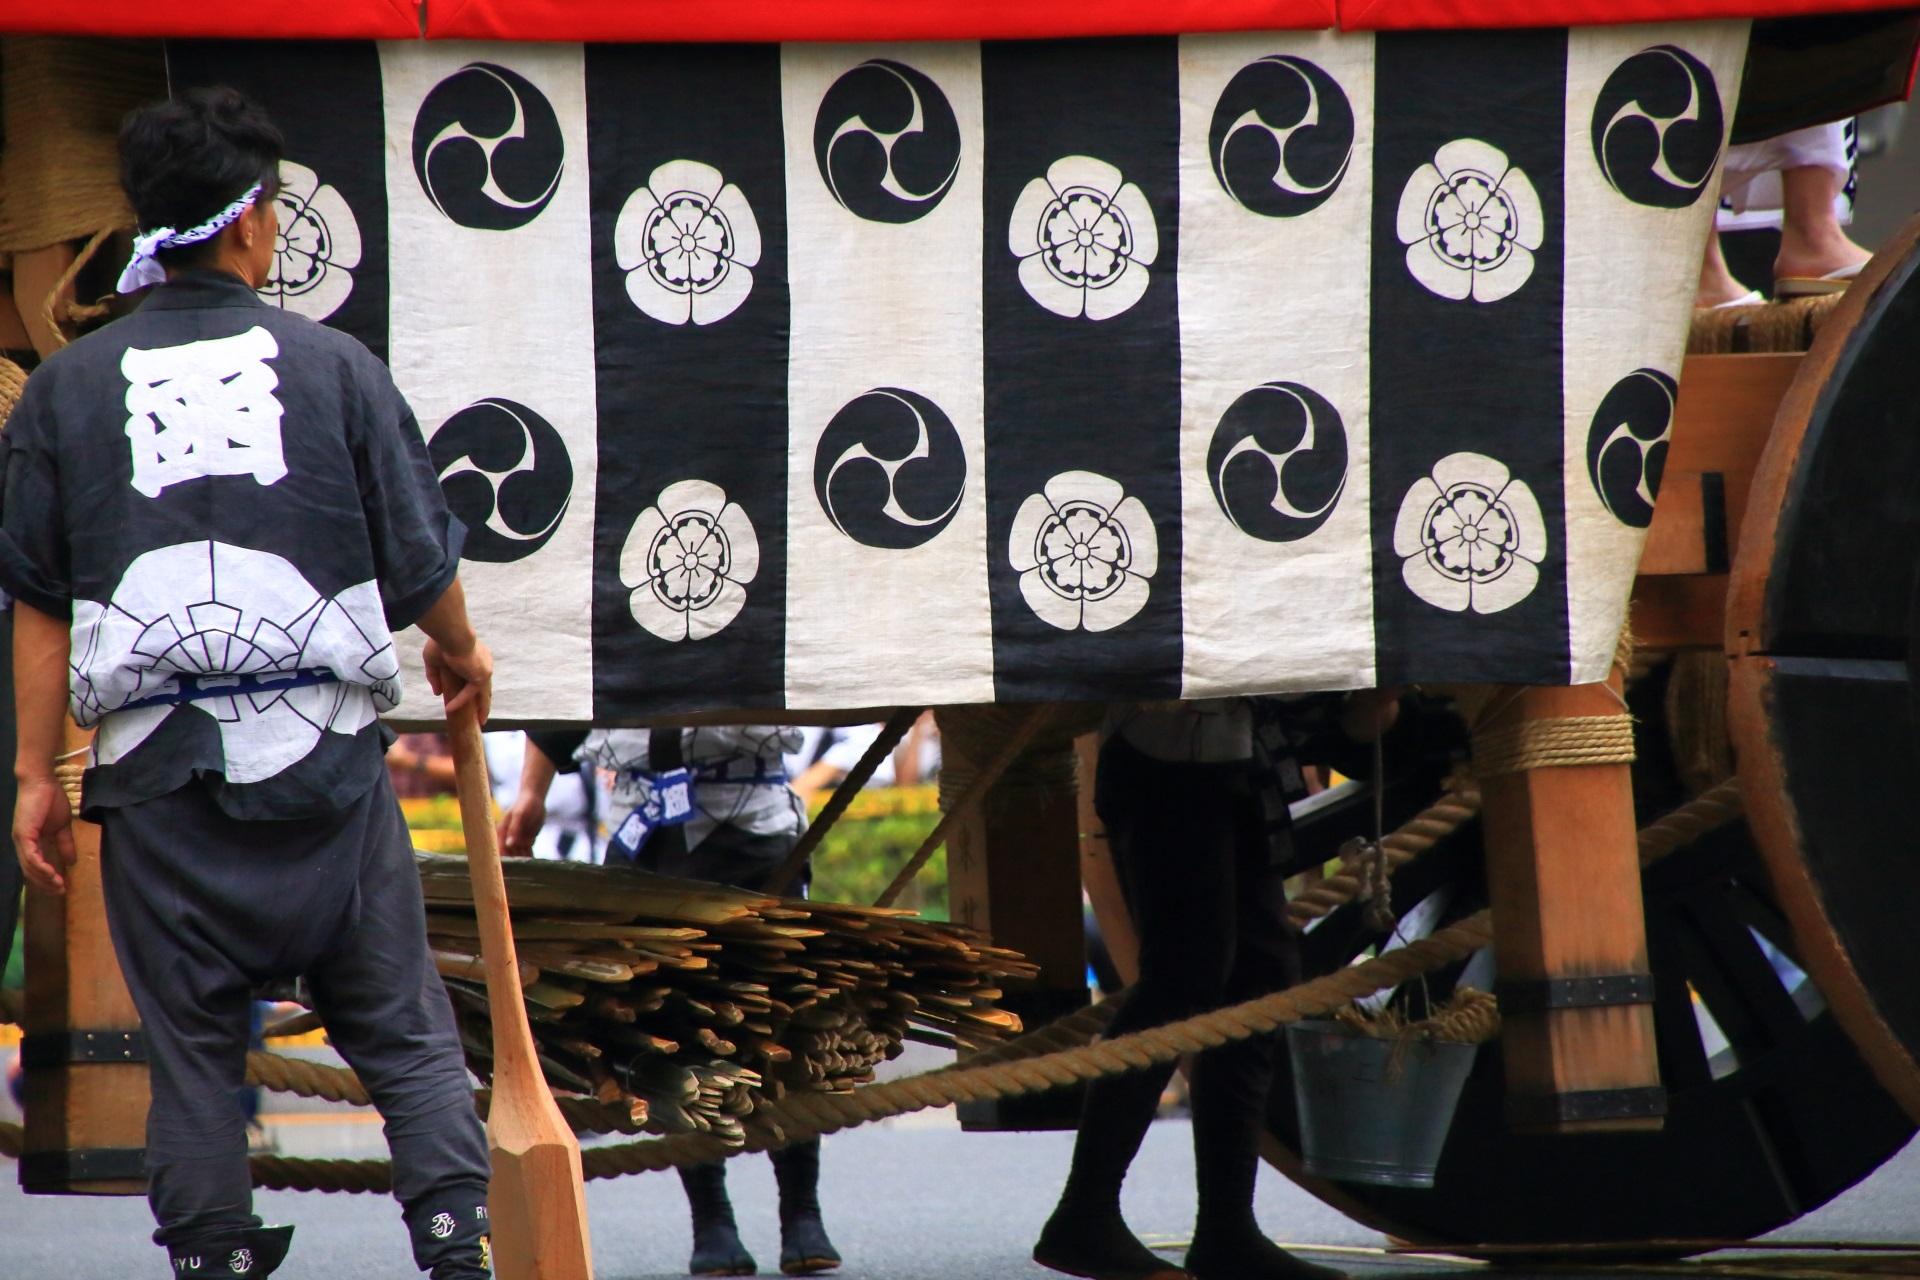 祇園祭山鉾巡行の函谷鉾